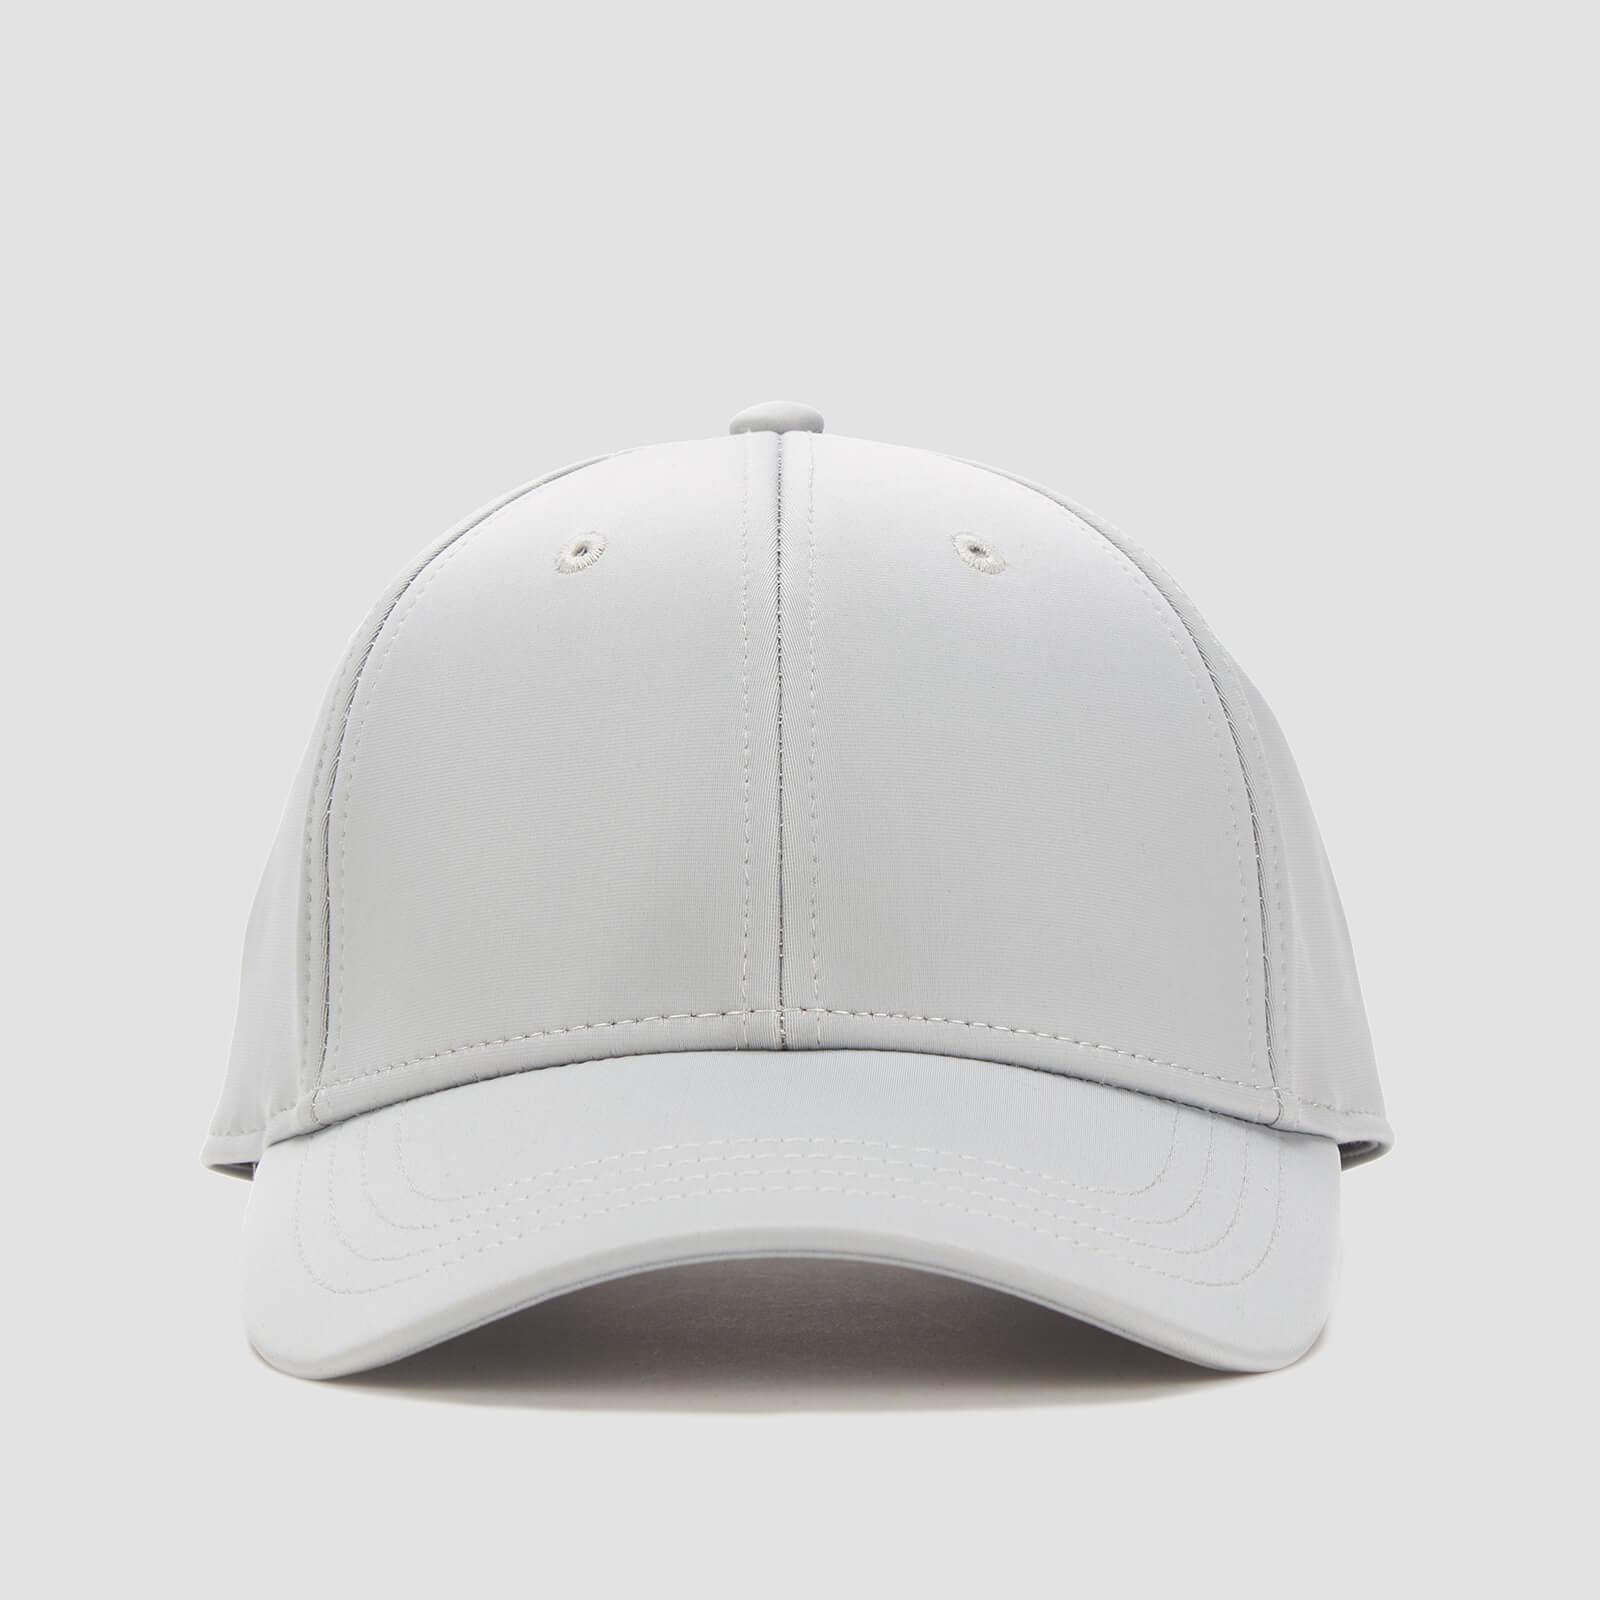 Myprotein Women's Luxe Baseball Cap - Sulphur Grey